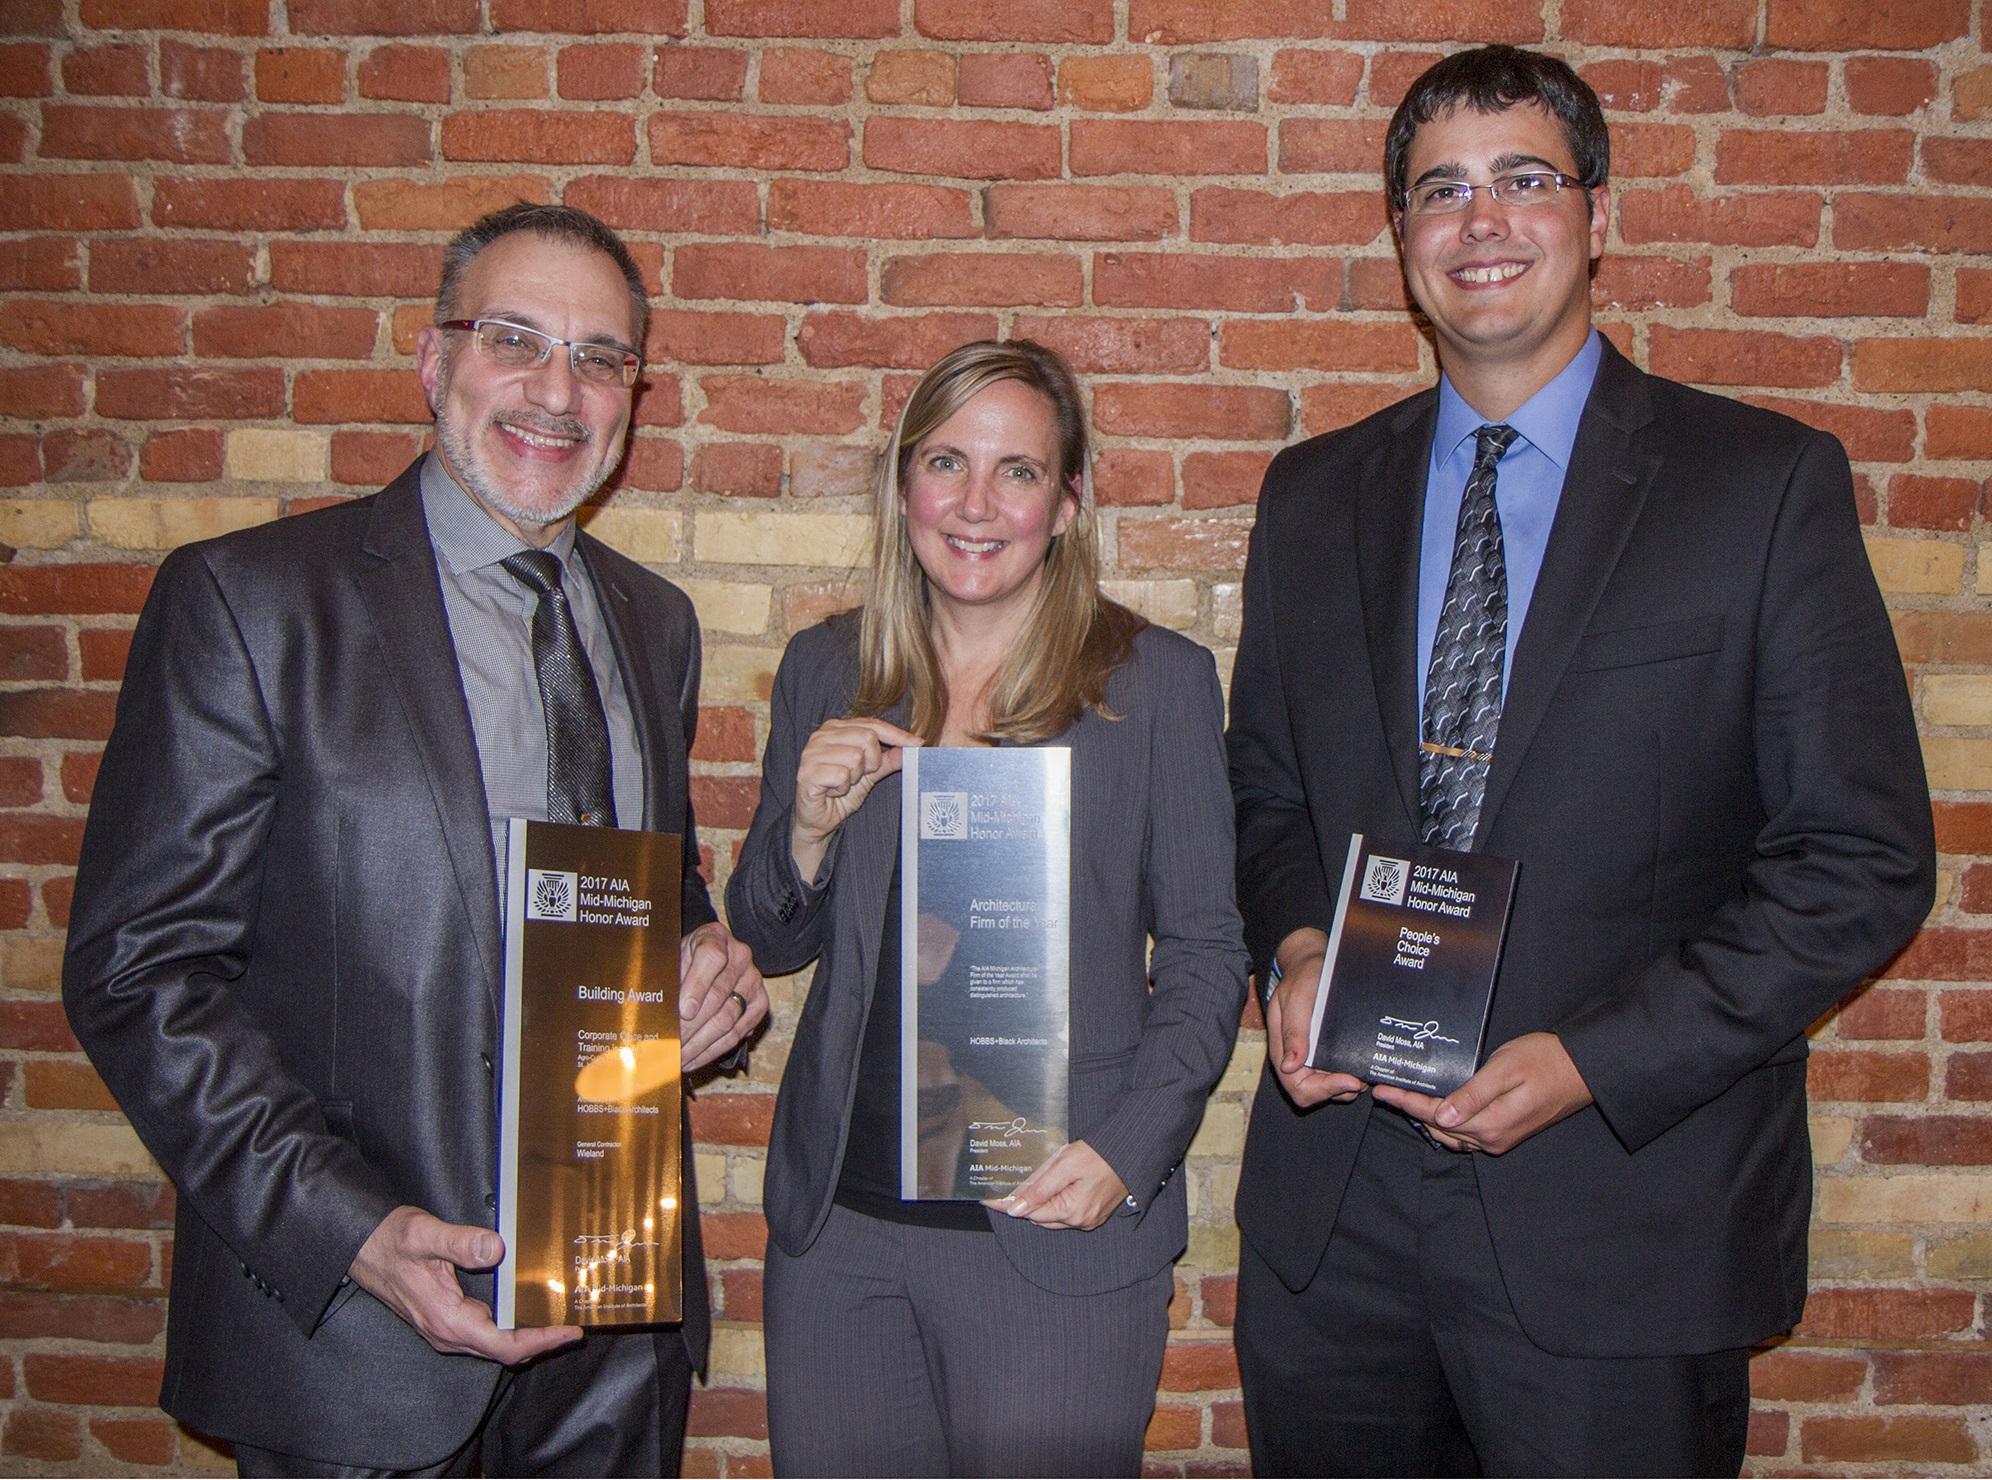 Mid Michigan AIA 3 Awards.jpg